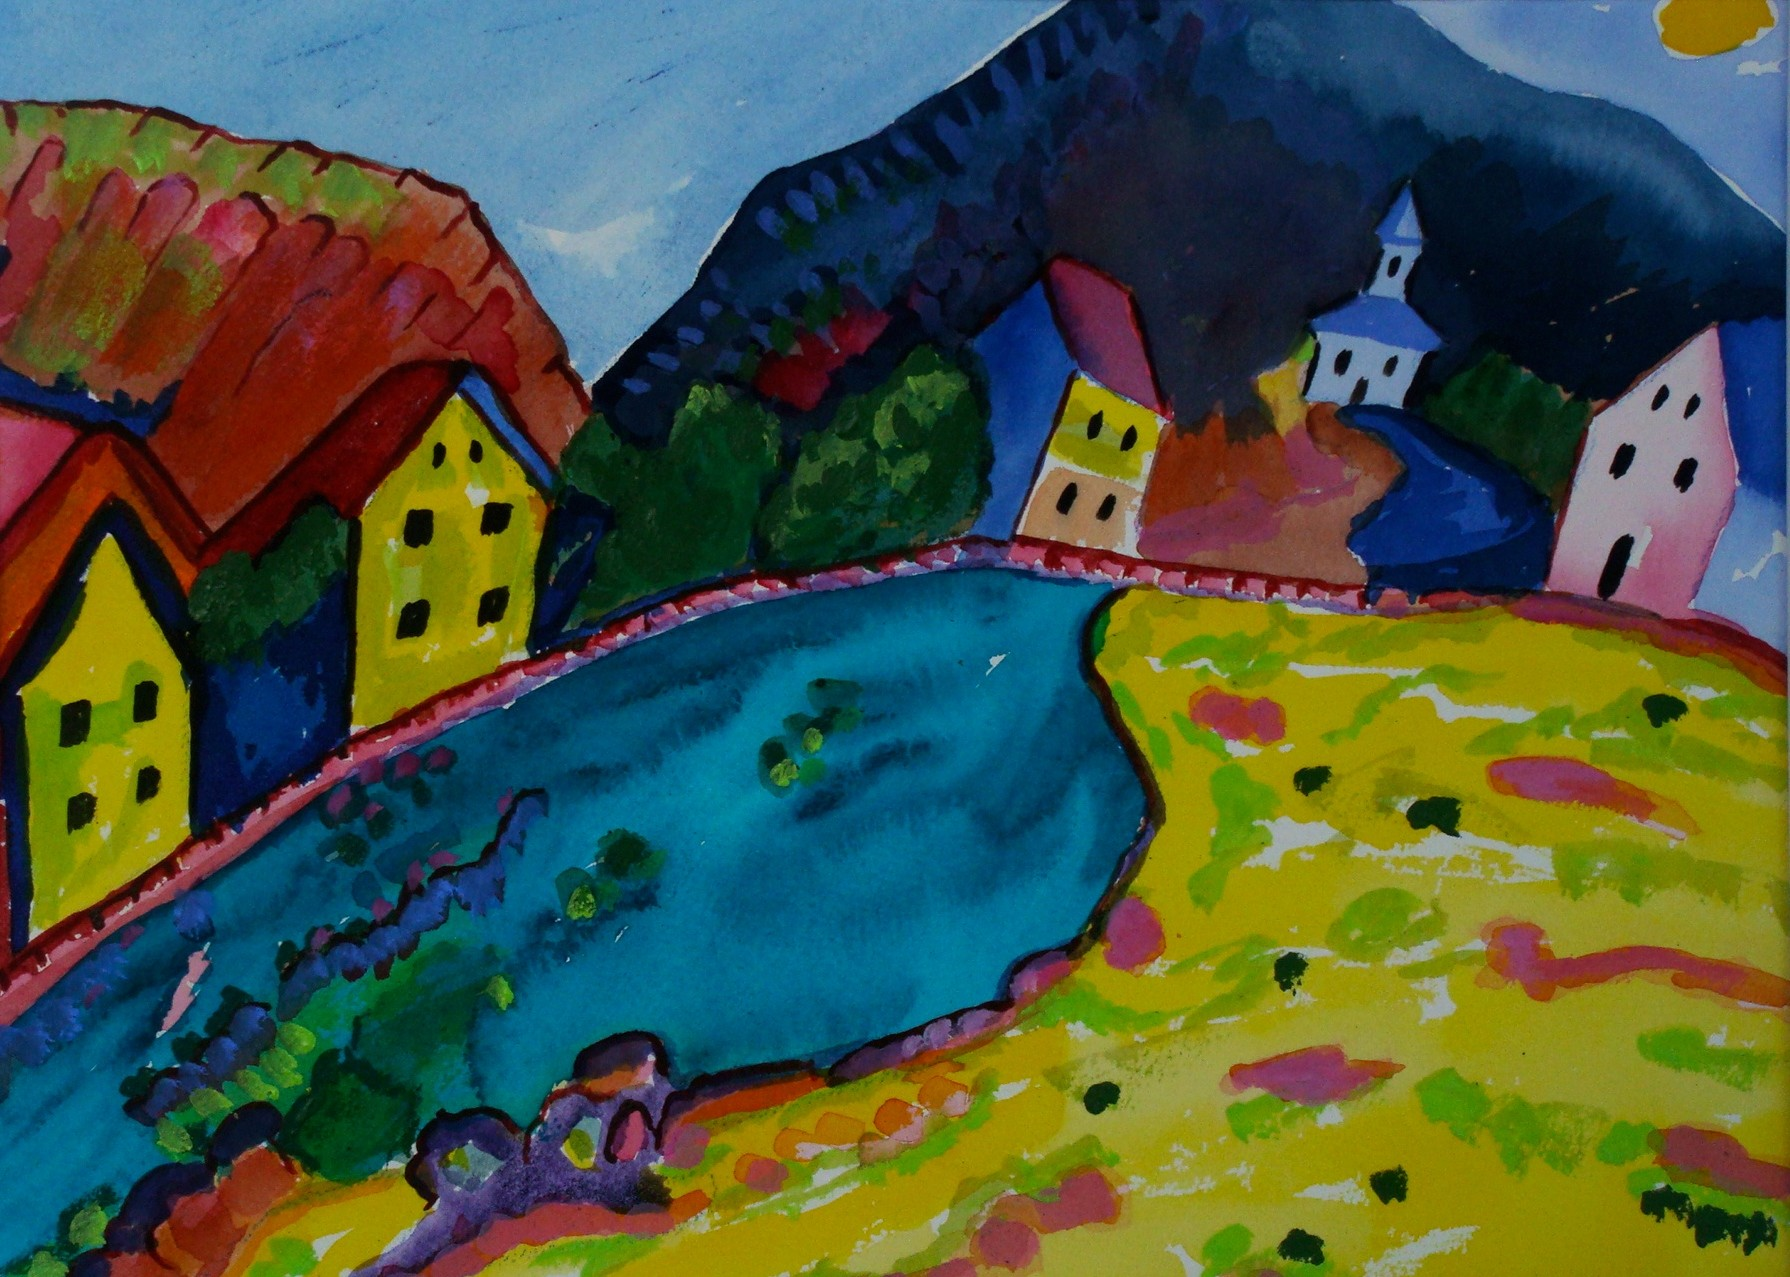 Murnau, watercolor, 13.5 x 10.5, 2014 SOLD